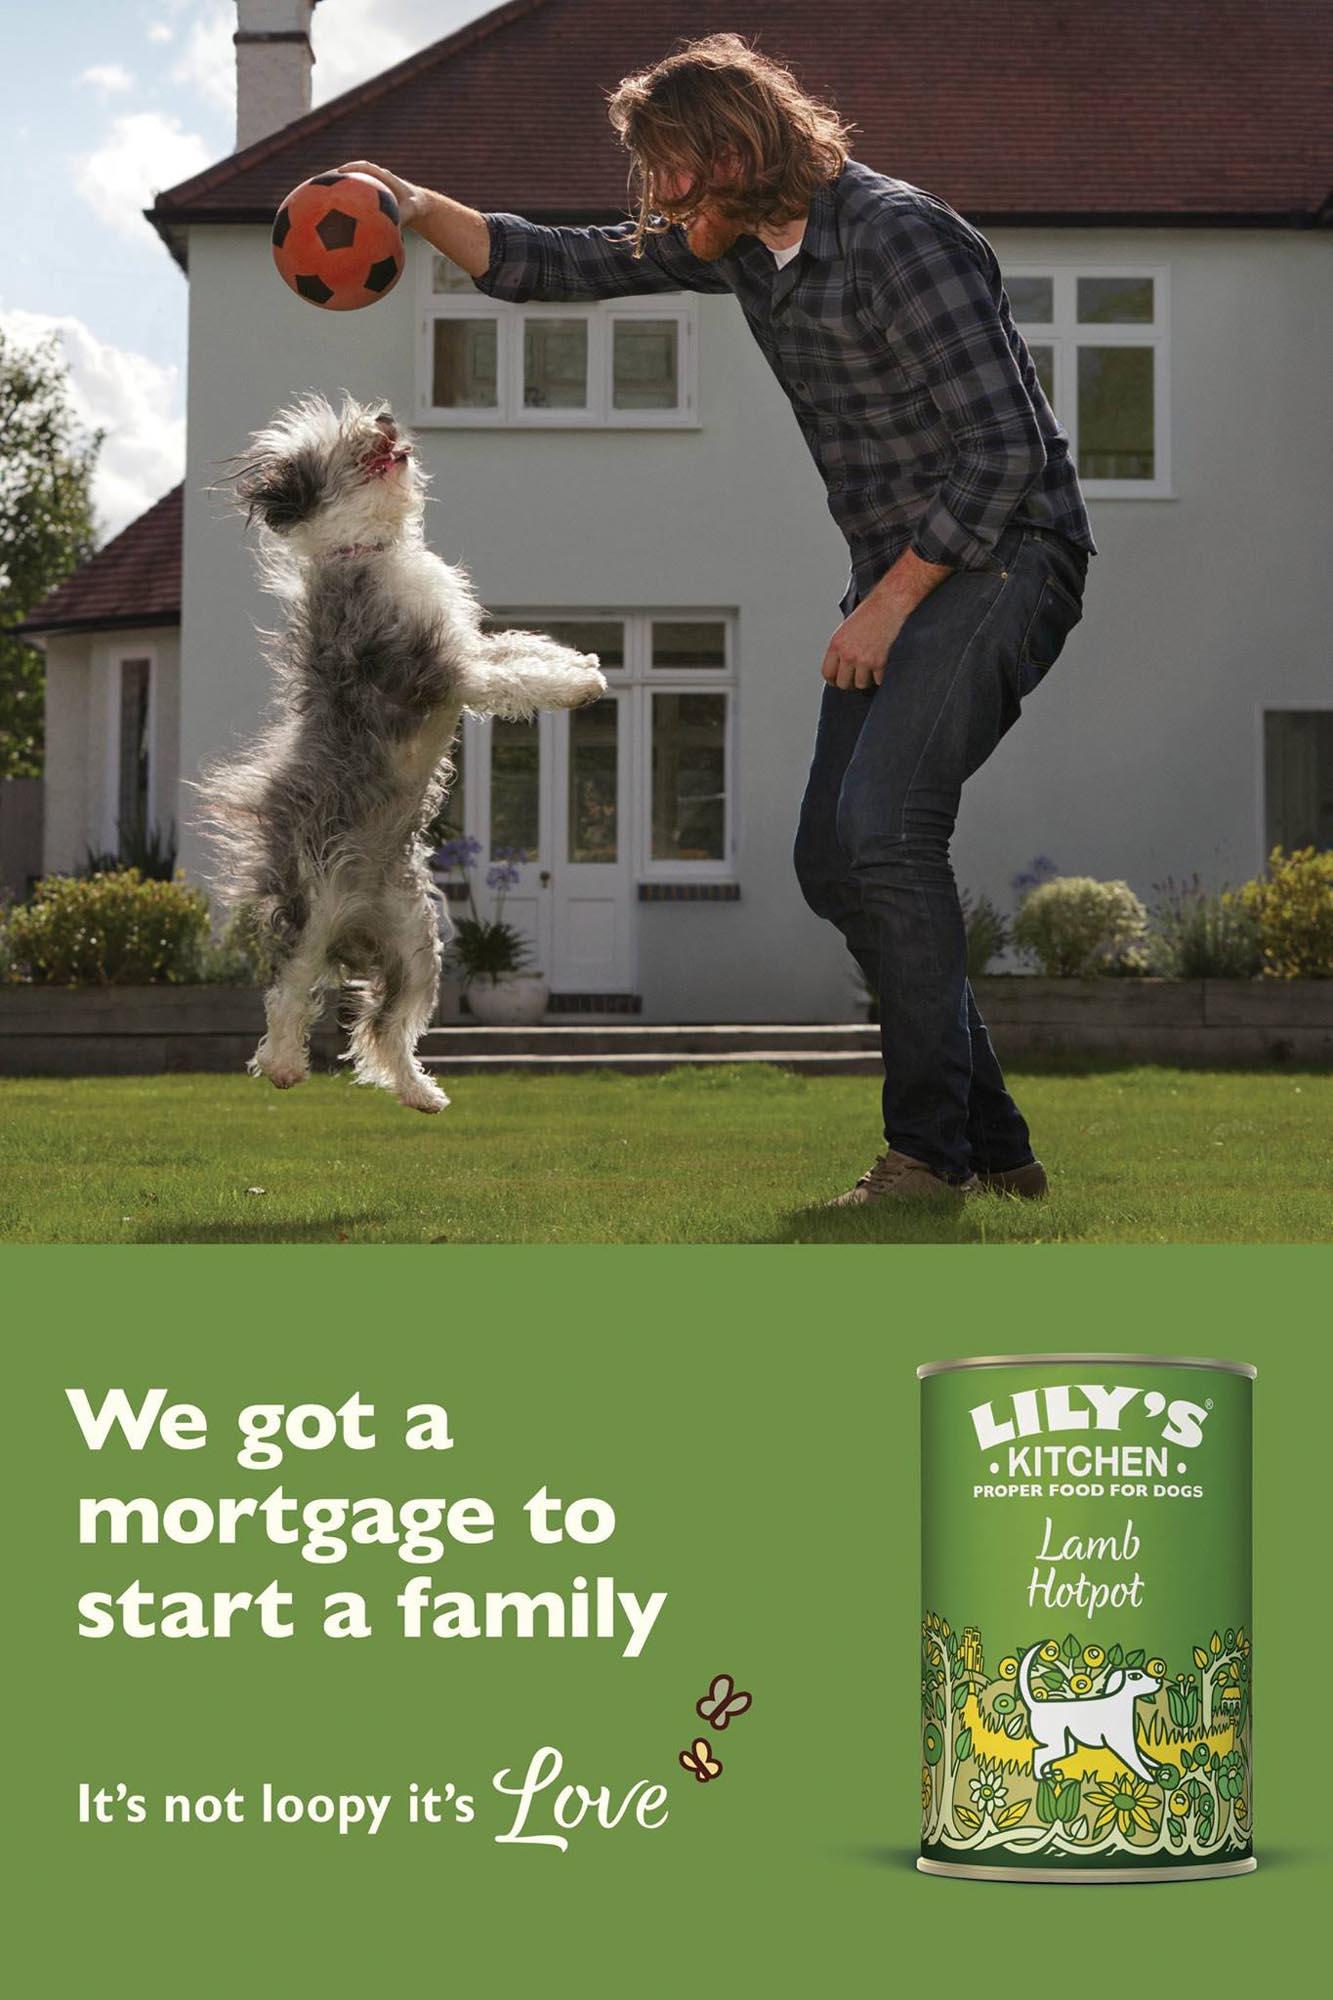 Lilys Kitchen Advert Photography Production by Luke Jackson